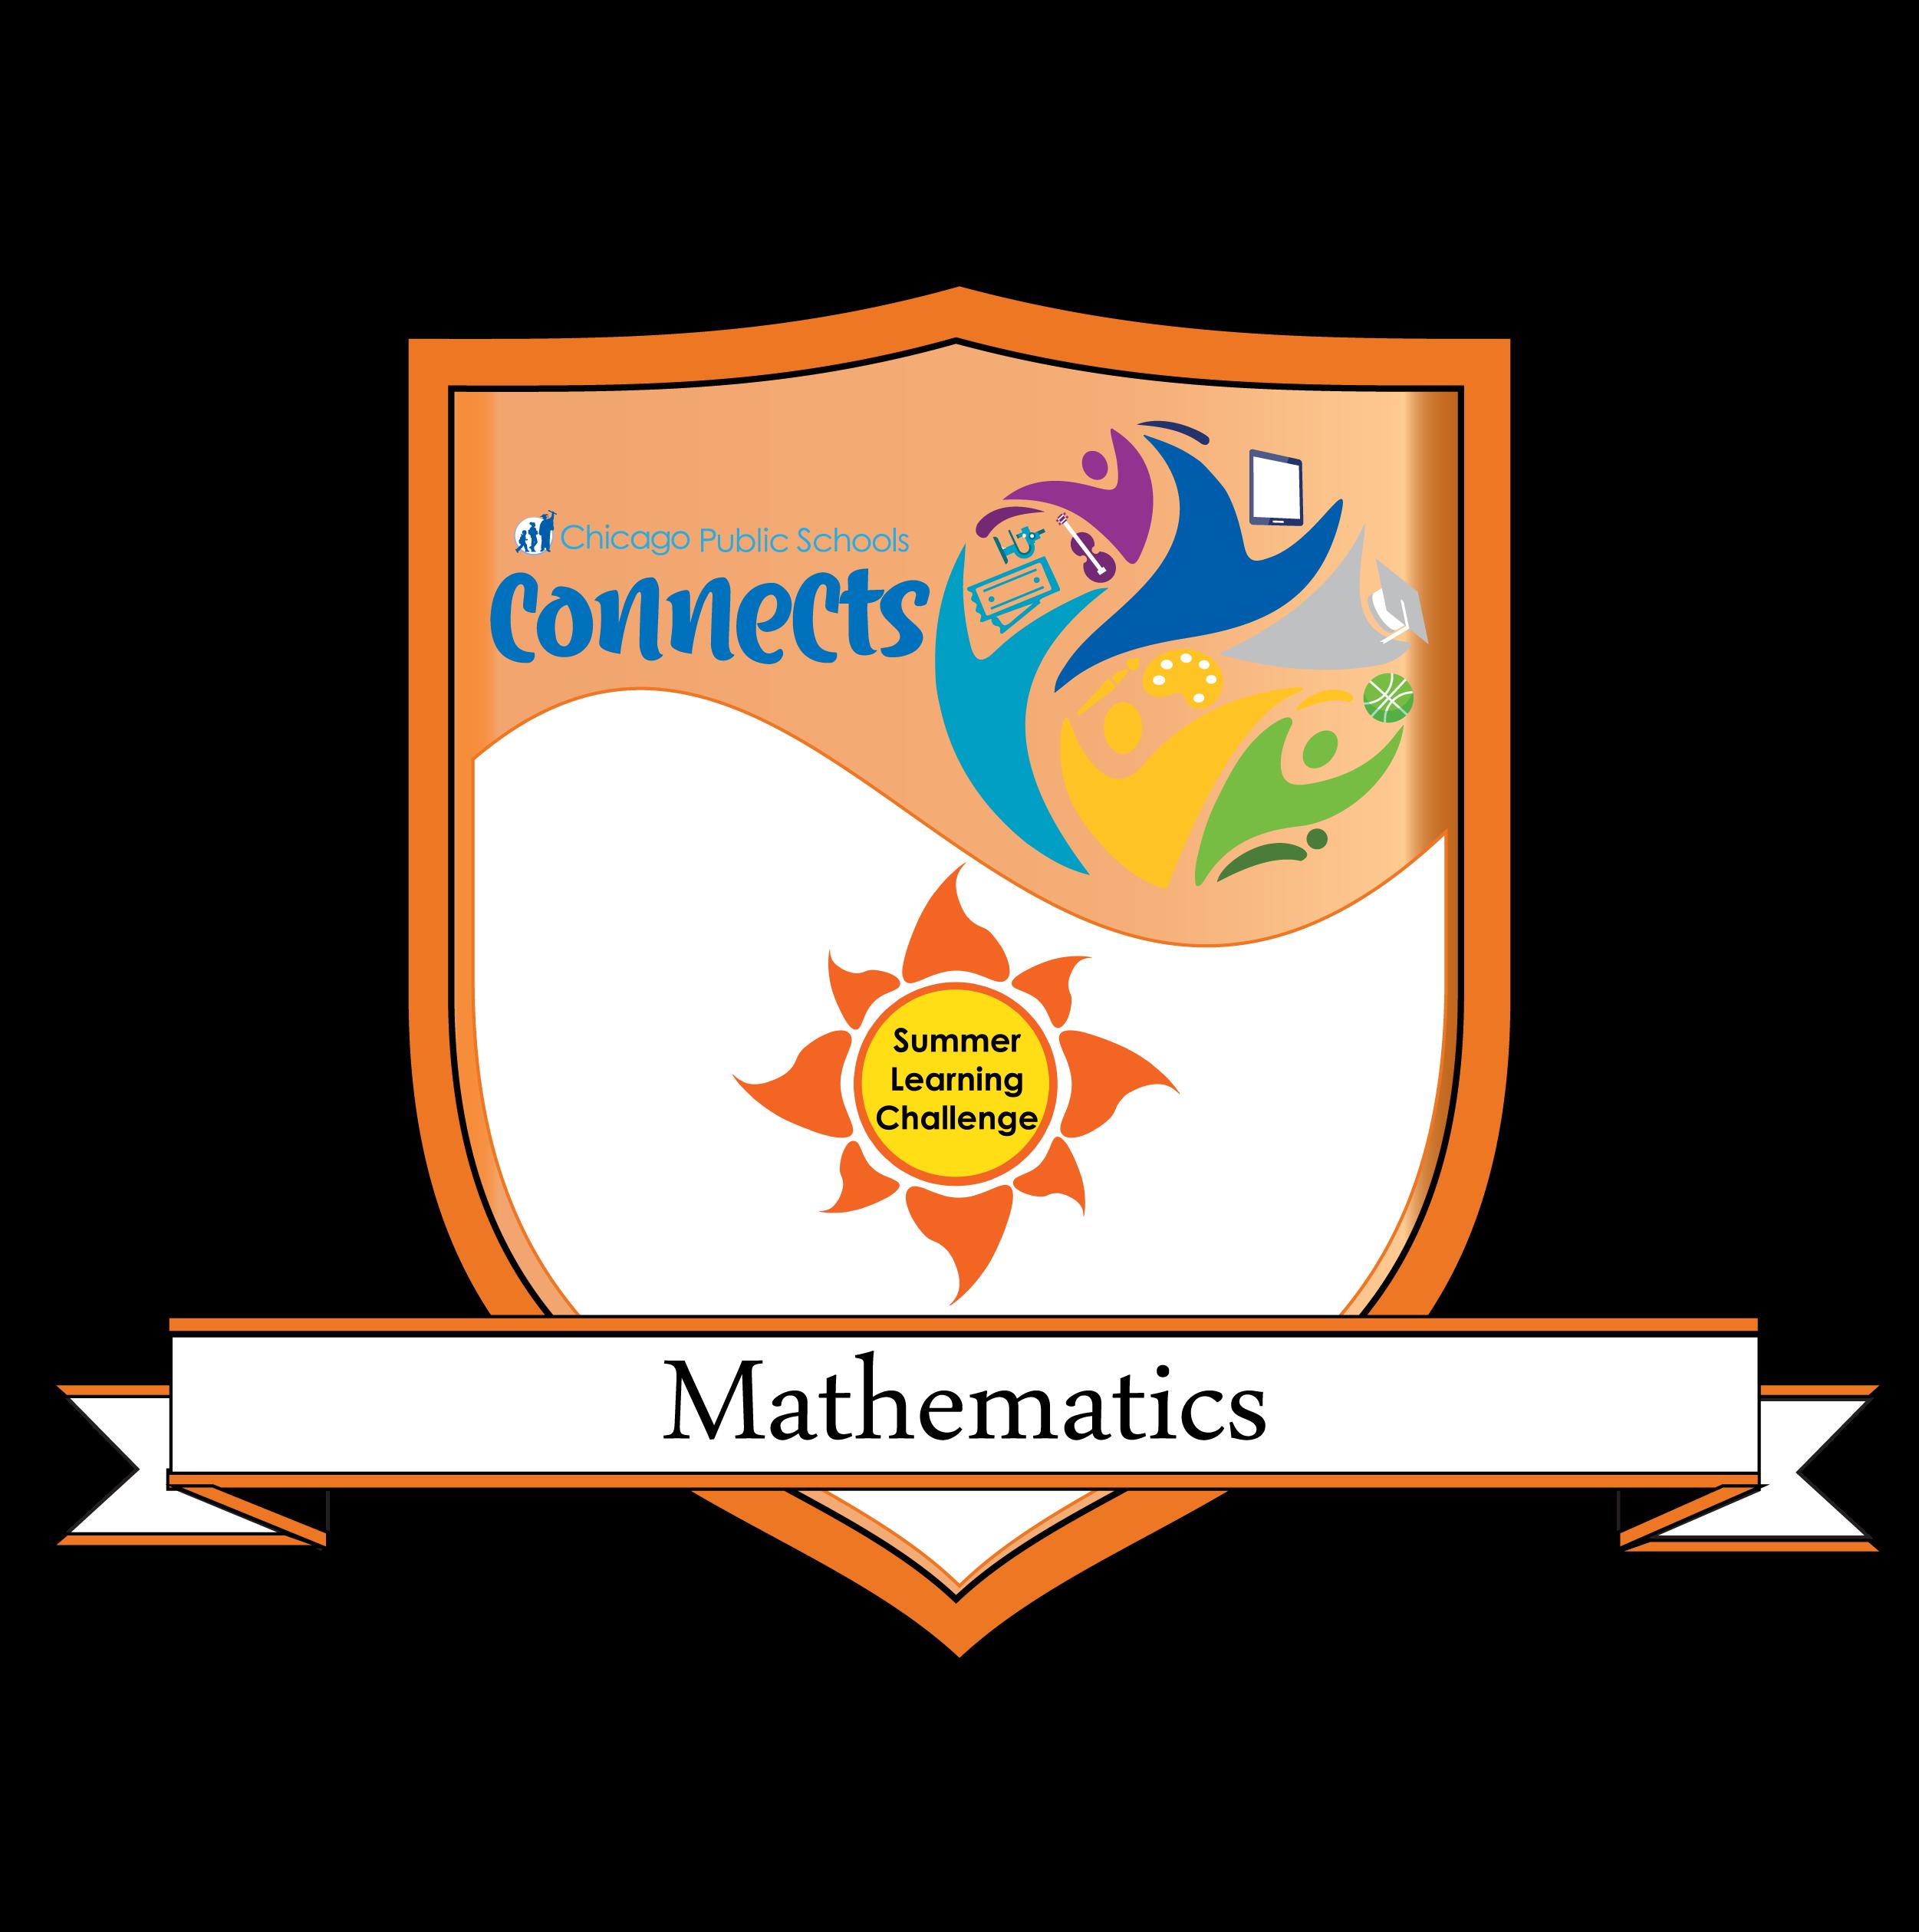 Mathemathics